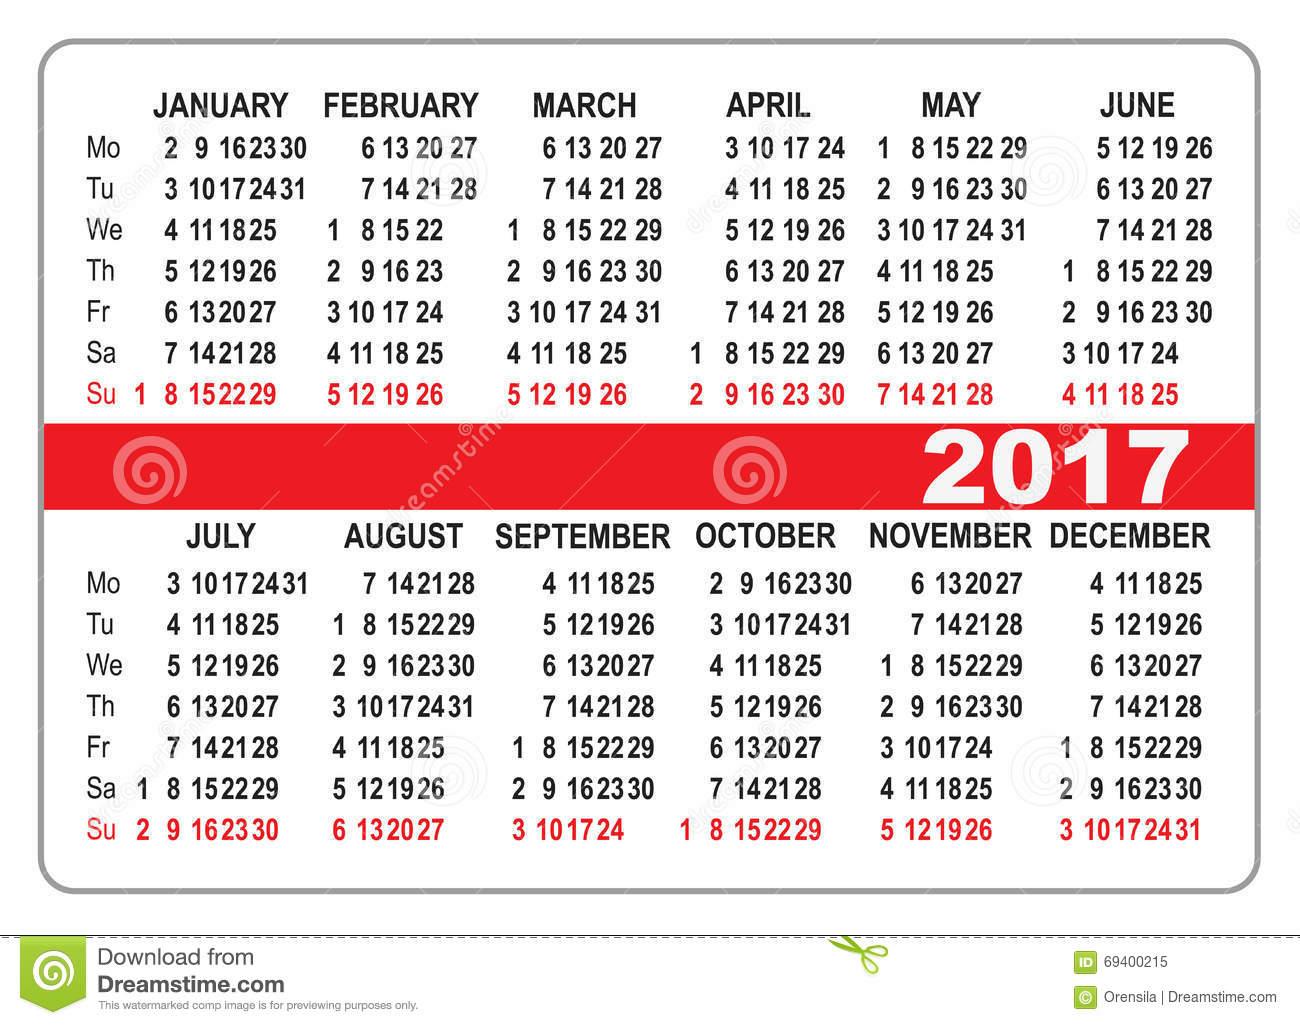 2017 Pocket Calendar | yearly calendar template